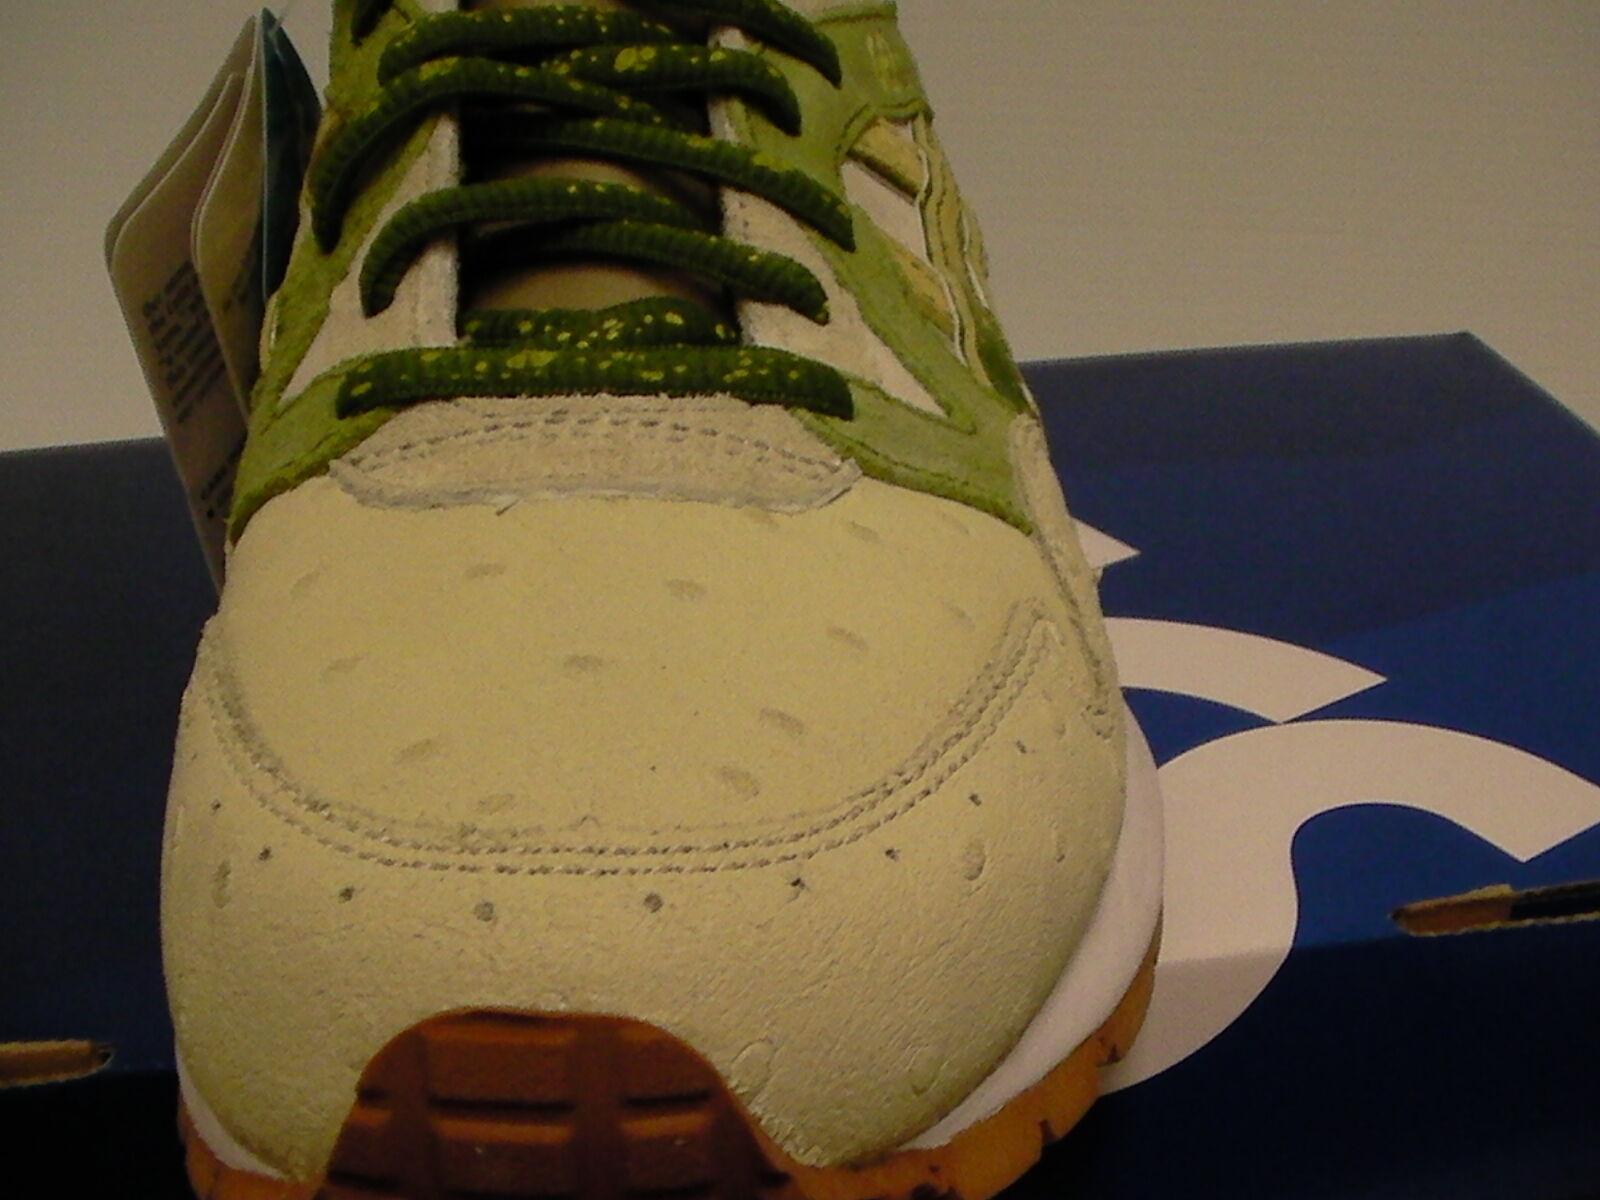 Asics running shoes gel-lyte v size 10 us men men men sand cactus green new with box 29c8a2